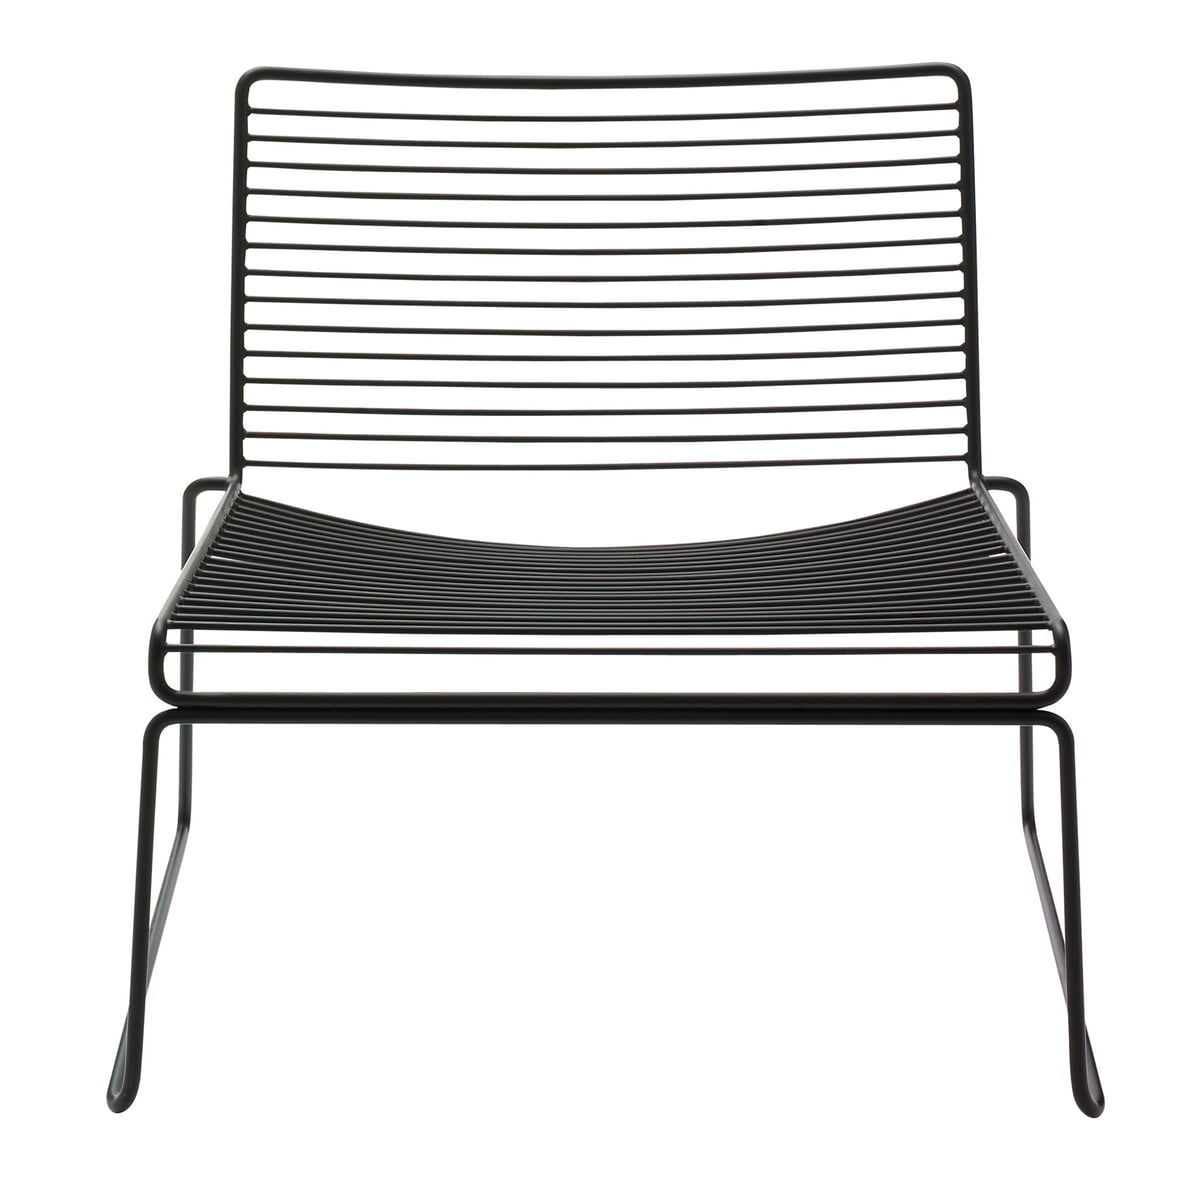 Zwarte Lounge Stoel.Hay Hee Lounge Chair Zwart